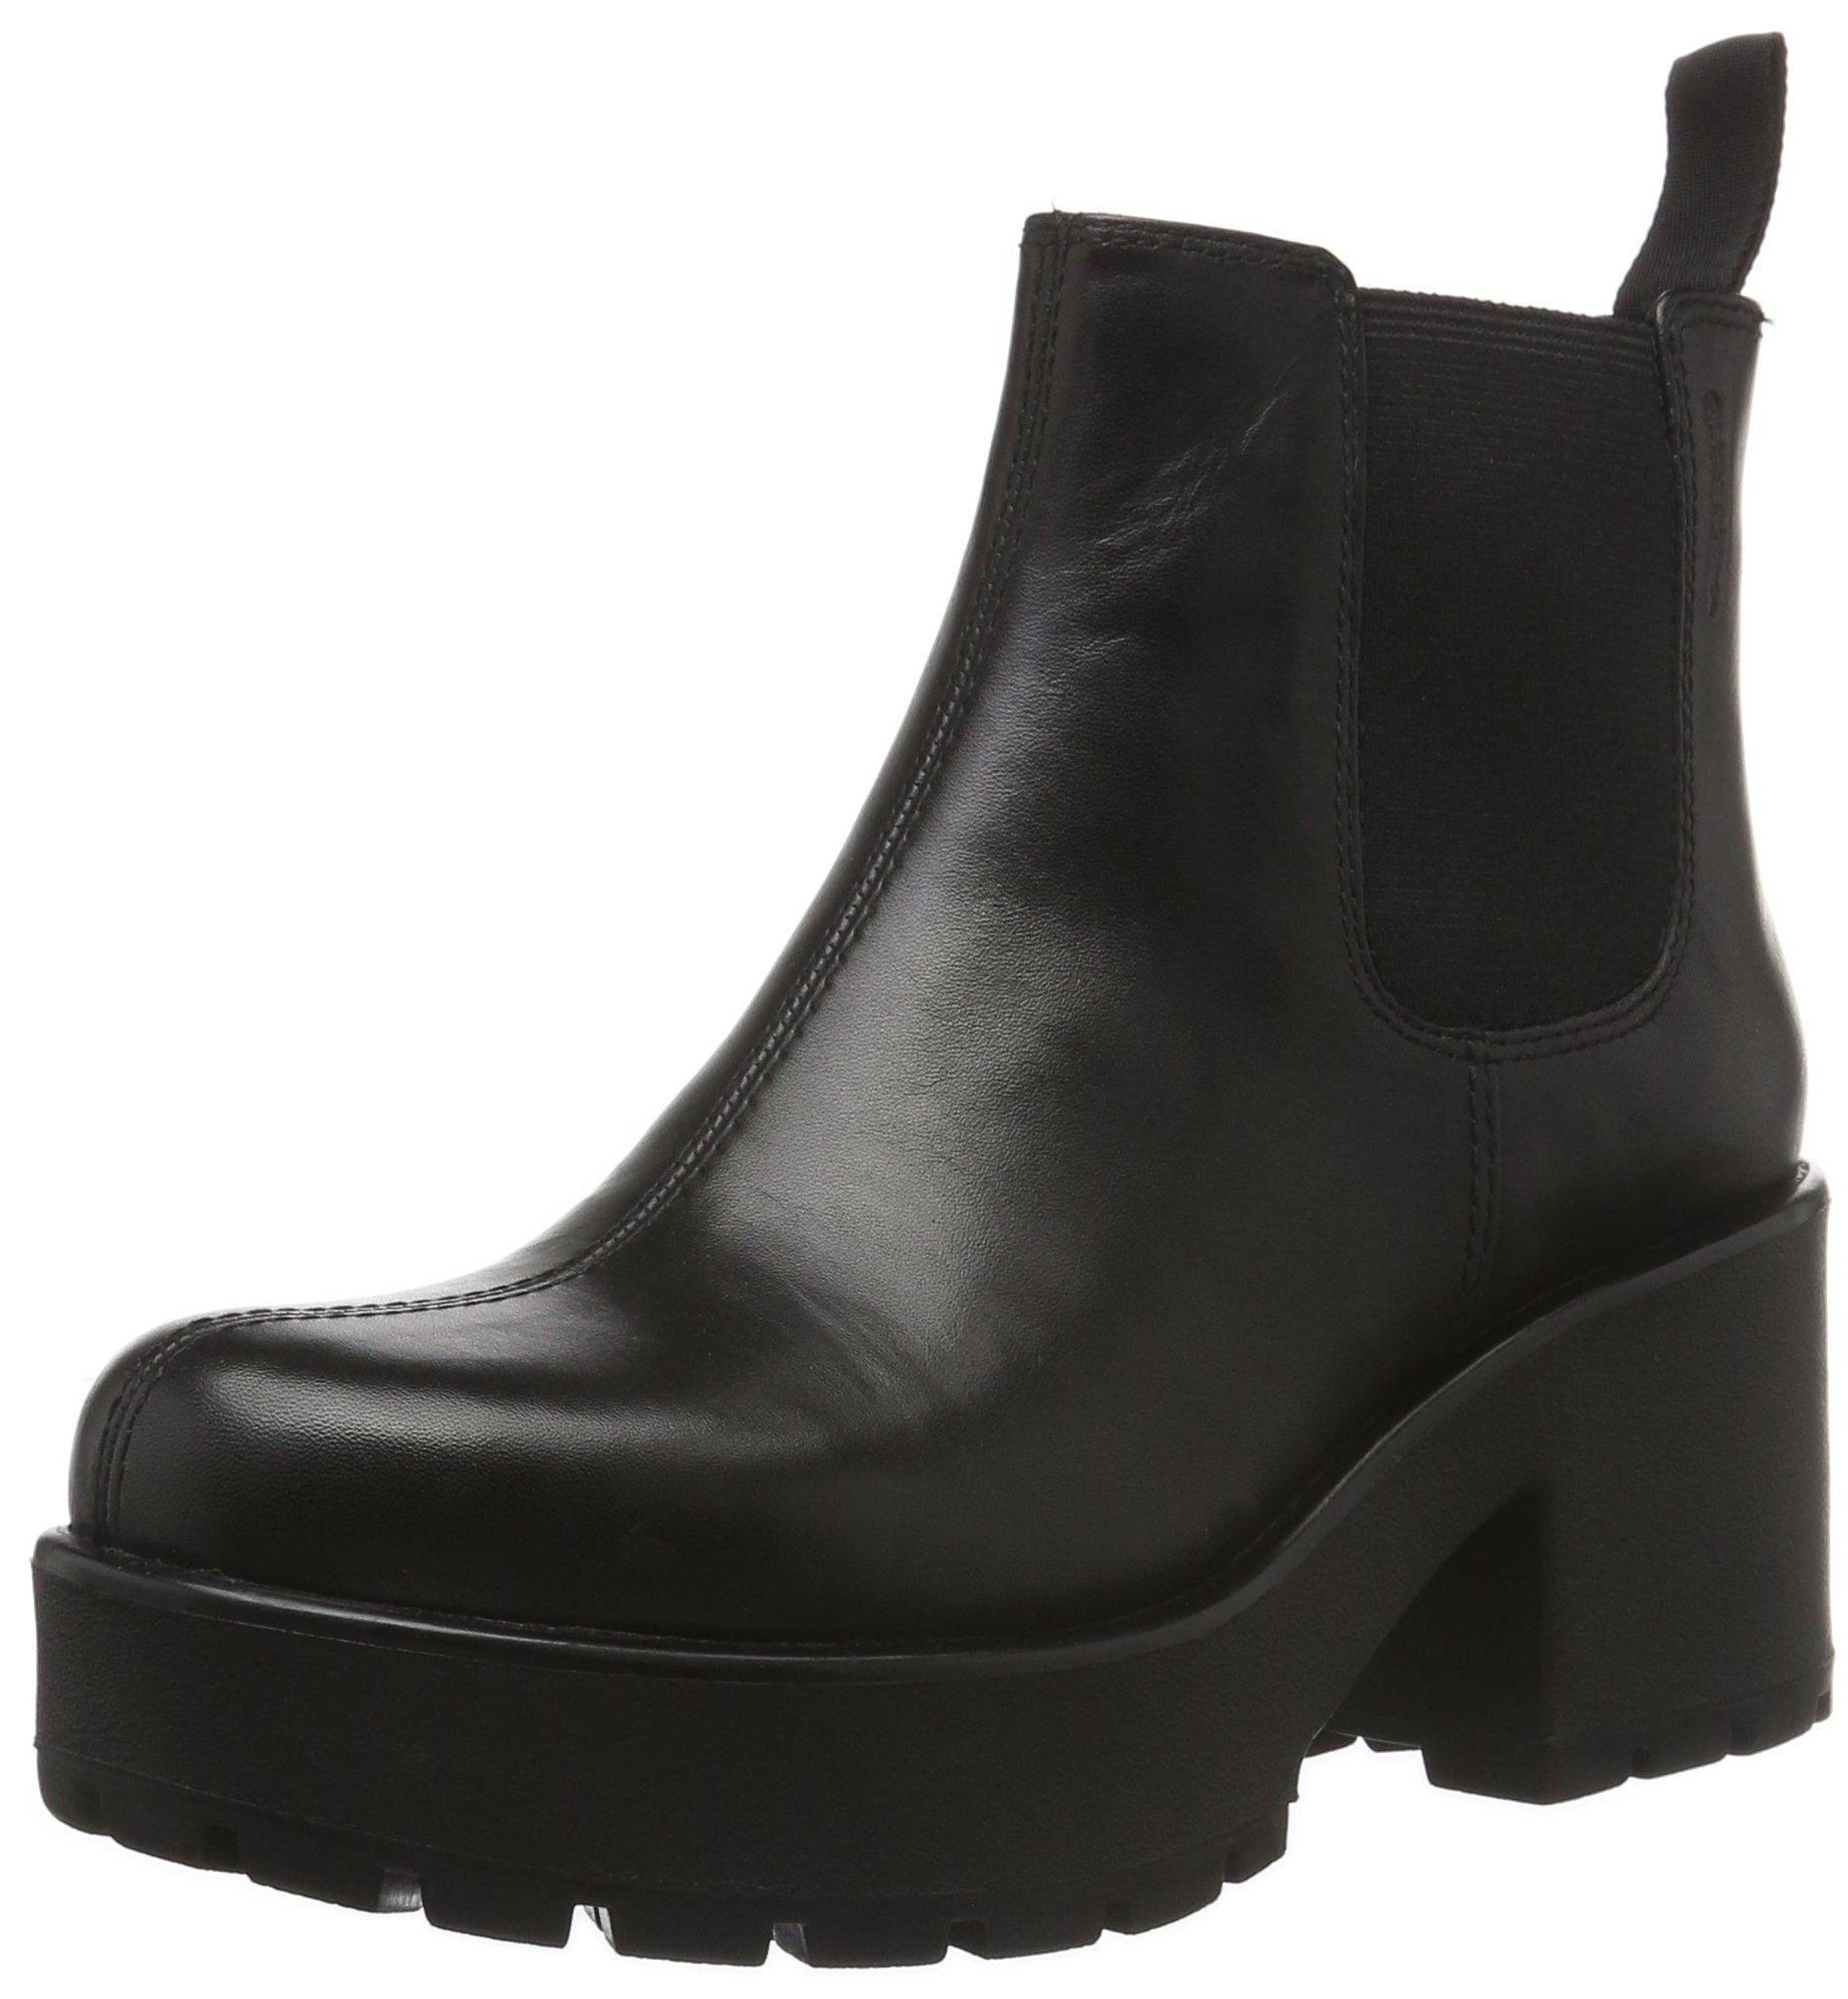 Black36 Chelsea Boots FemmeSchwarz20 Eu Dioon Vagabond IWYHED92